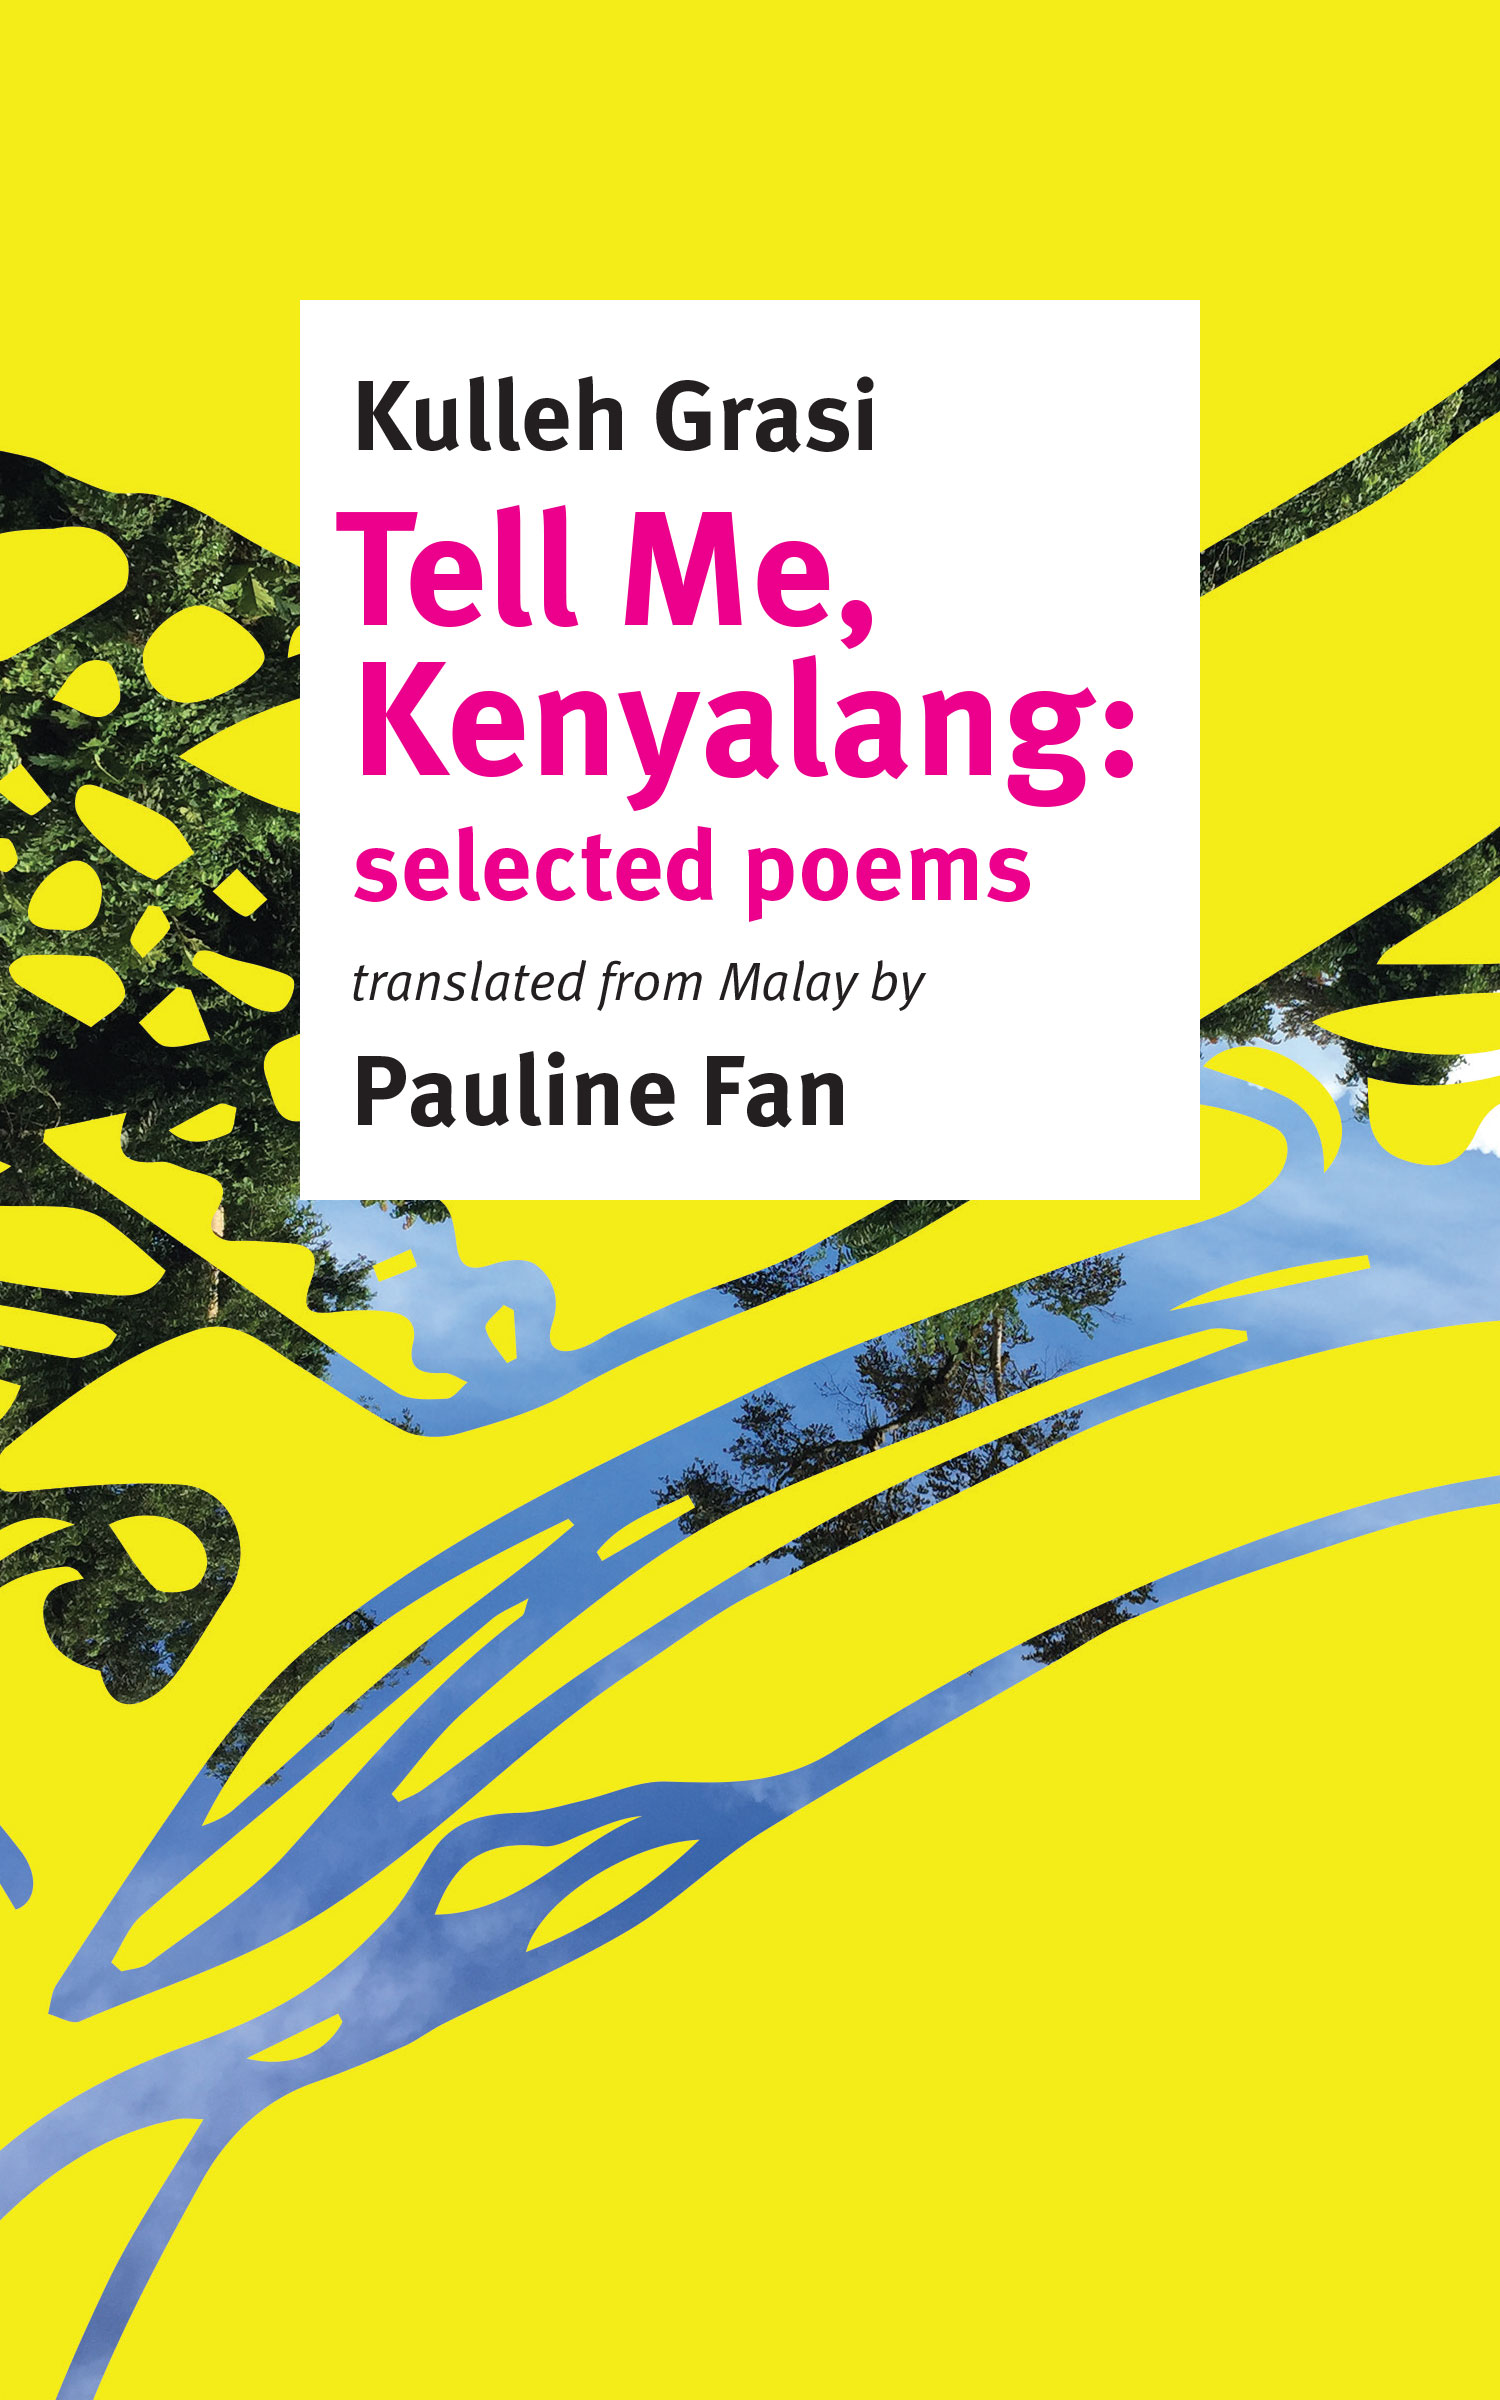 Tell Me, Kenyalang (Circumference Books, 2019) By Kulleh Grasi, Trans. by  Pauline Fan